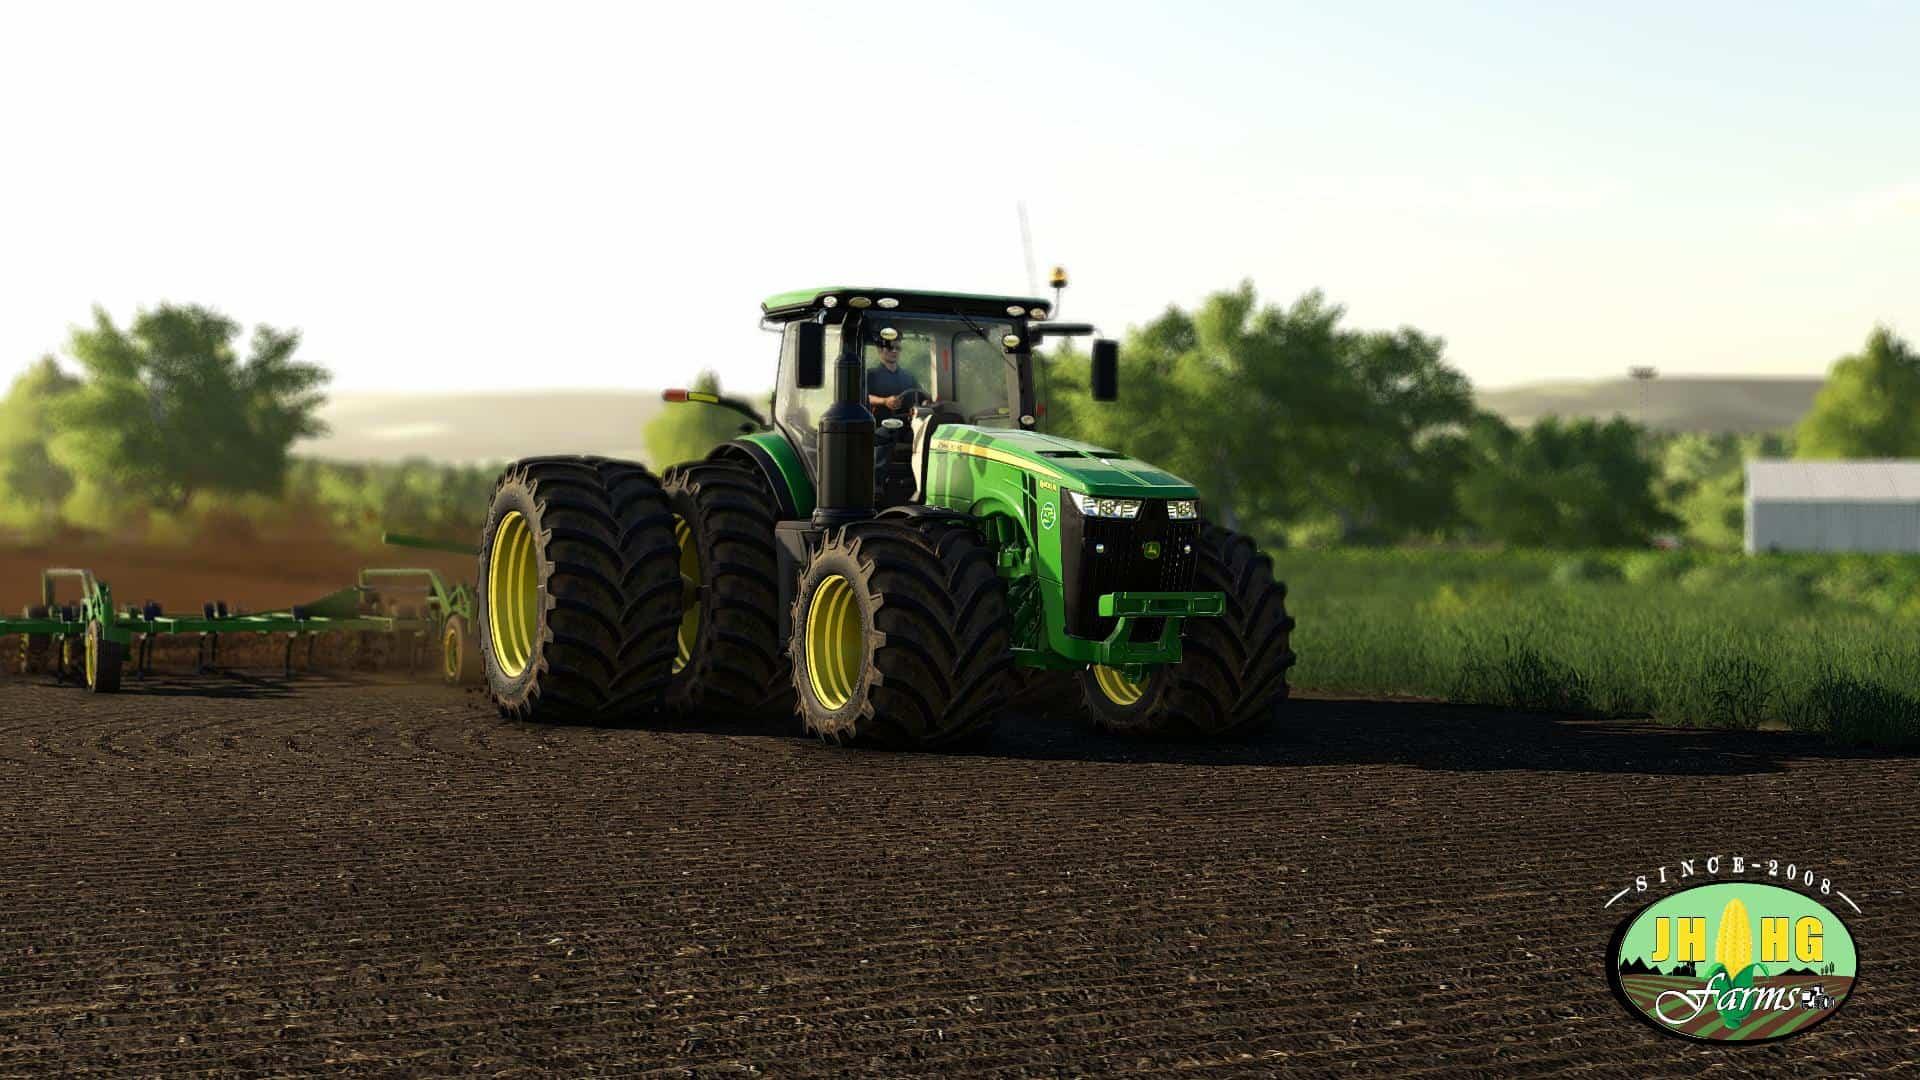 John Deere 8R US Series 2018 v3 1 Mod - Farming Simulator 19 Mod / FS19